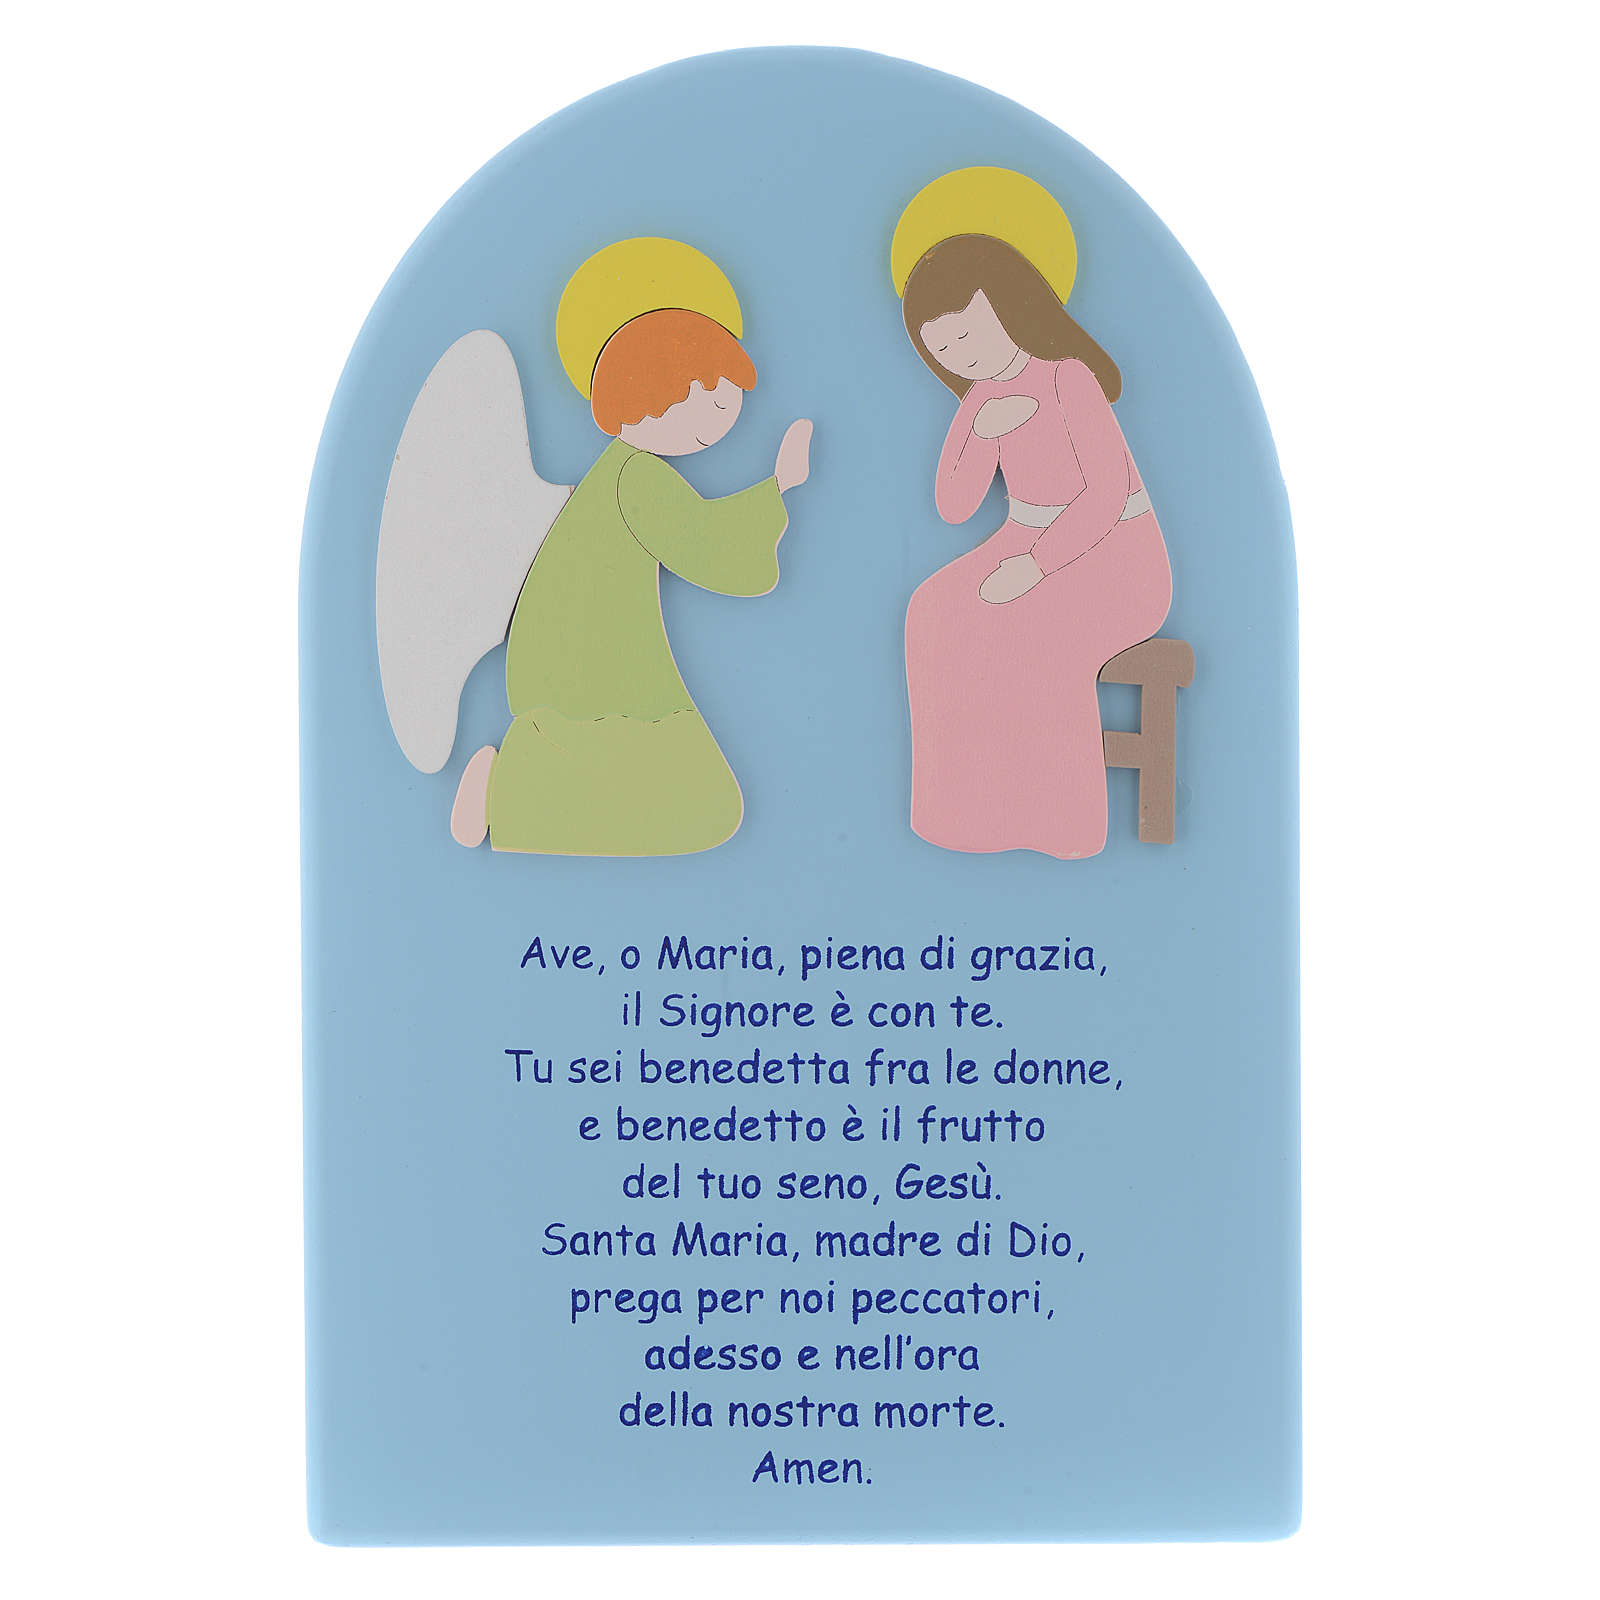 Annunciation shovel in light blue wood 25x15 cm with Hail Mary prayer in ITALIAN 4